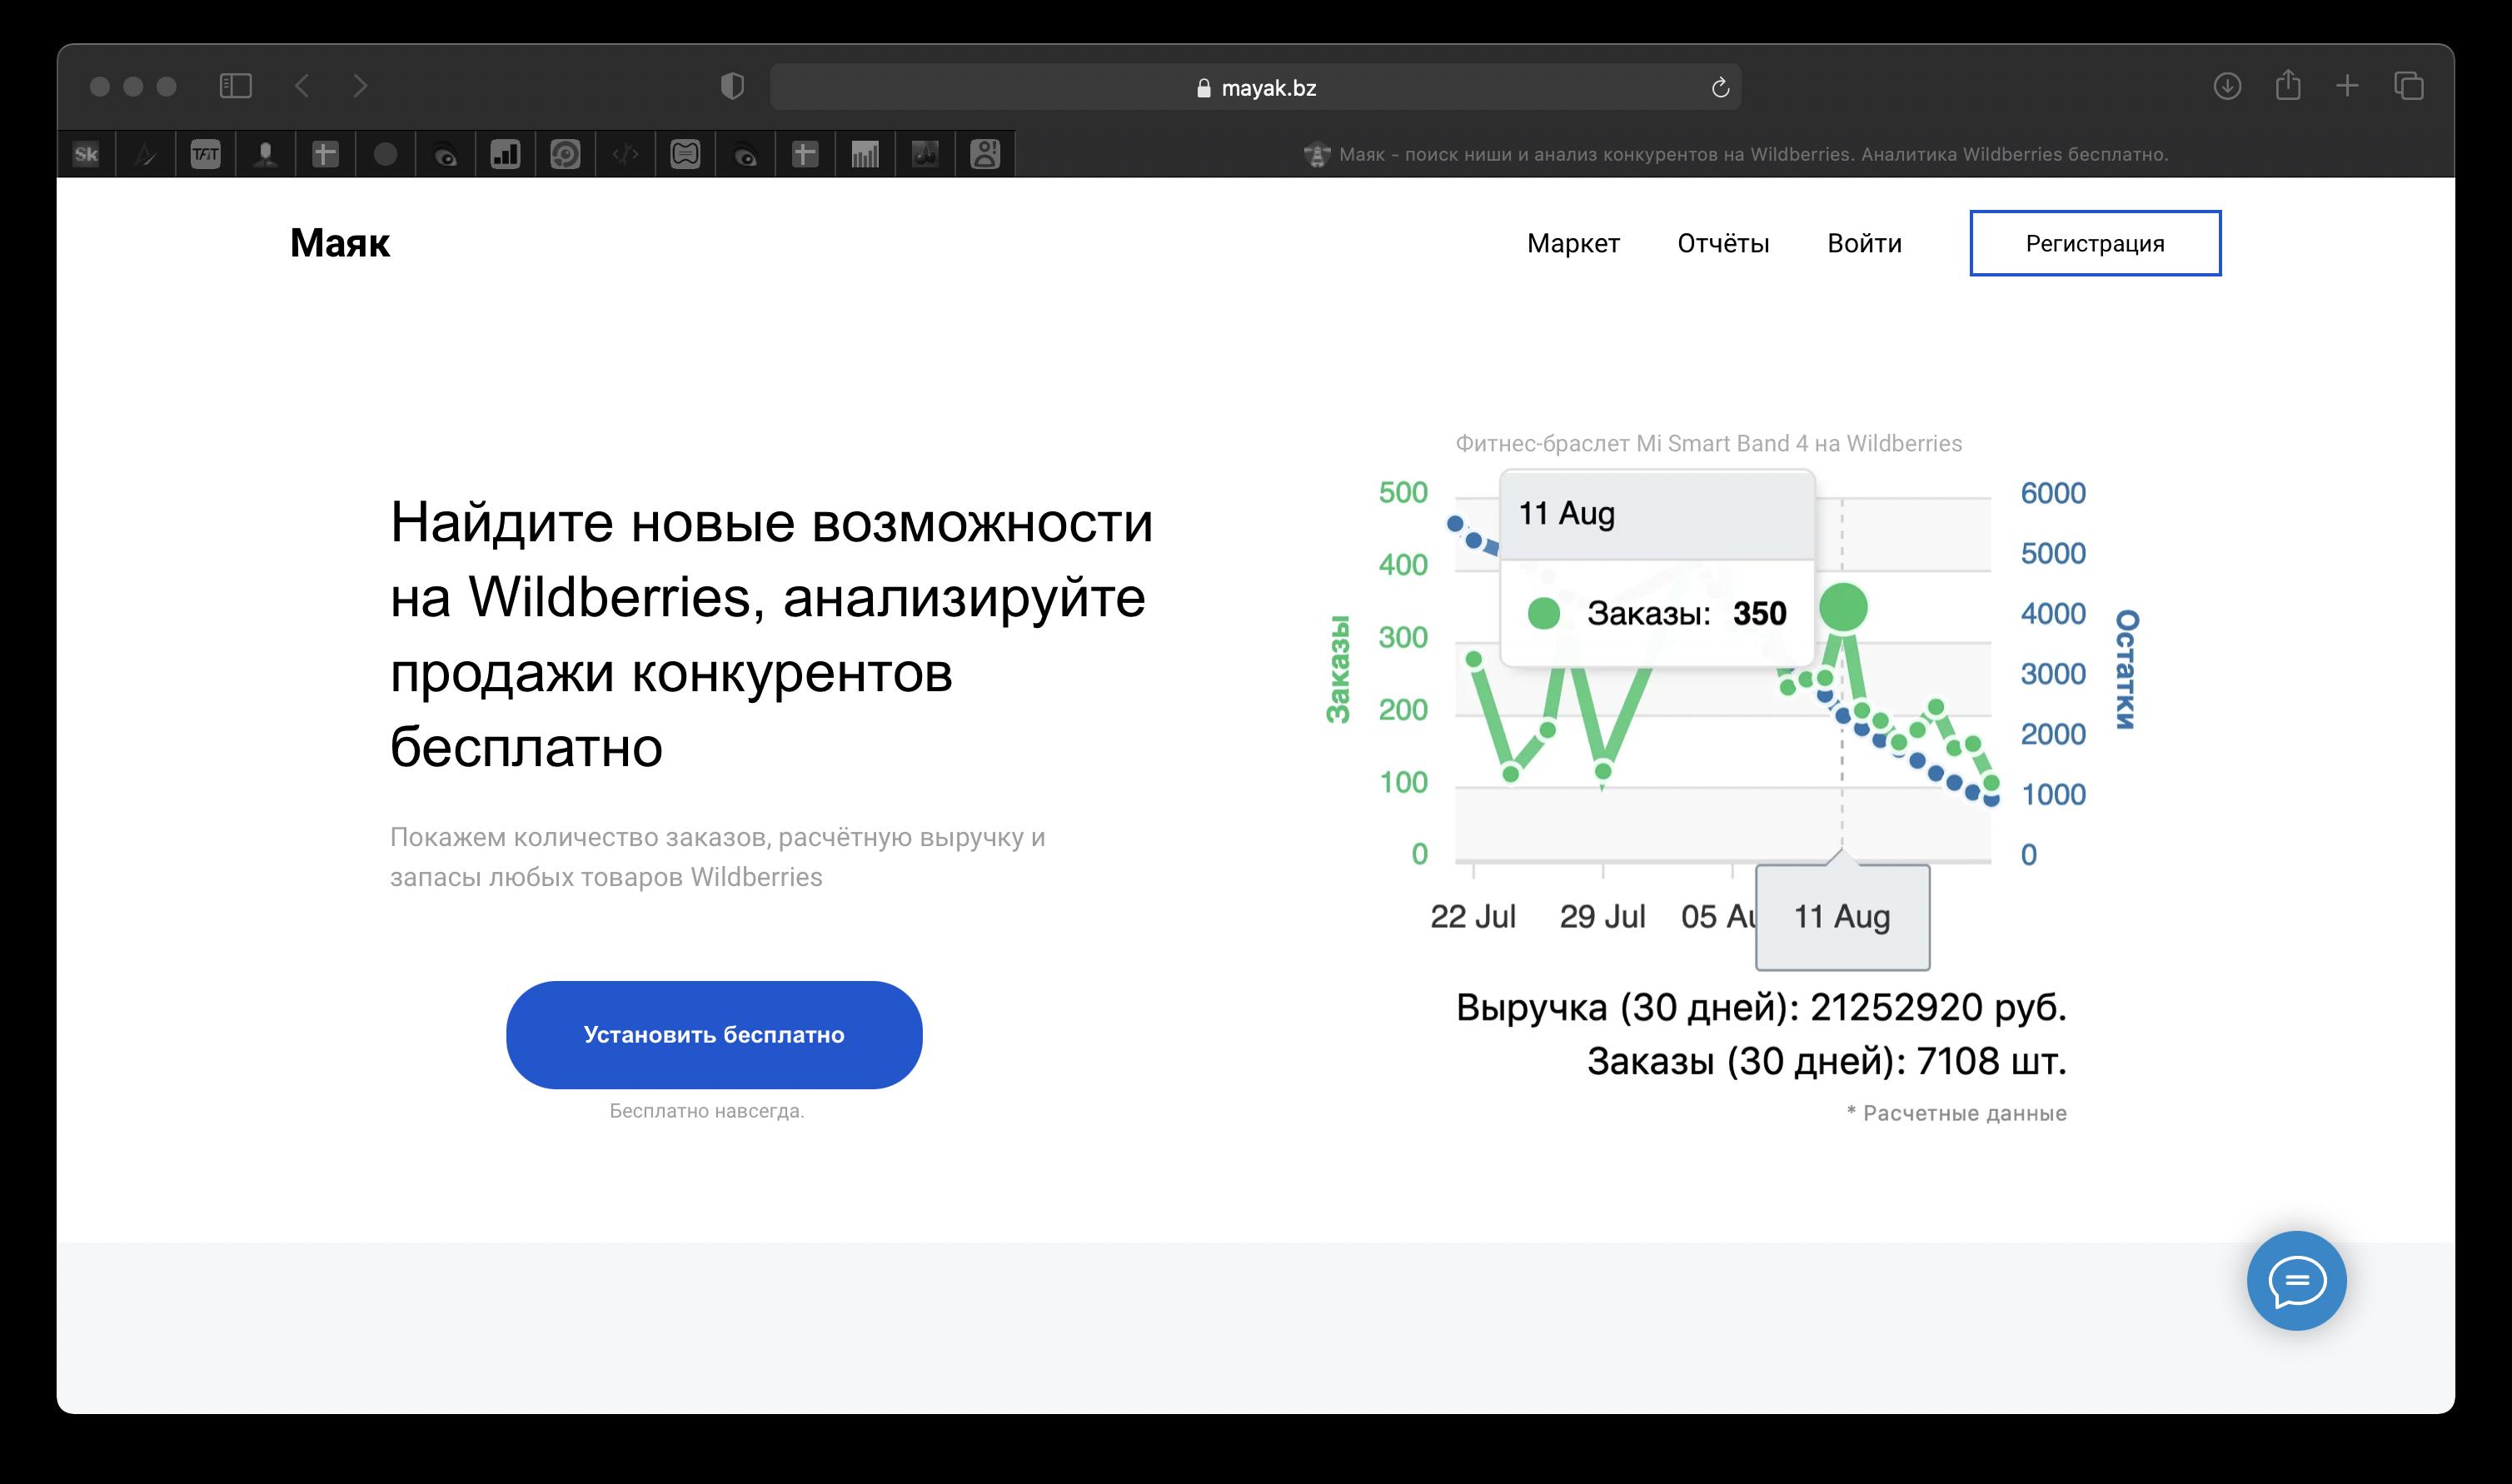 сервис для аналитики вайлдберриз в формате плагина для браузера